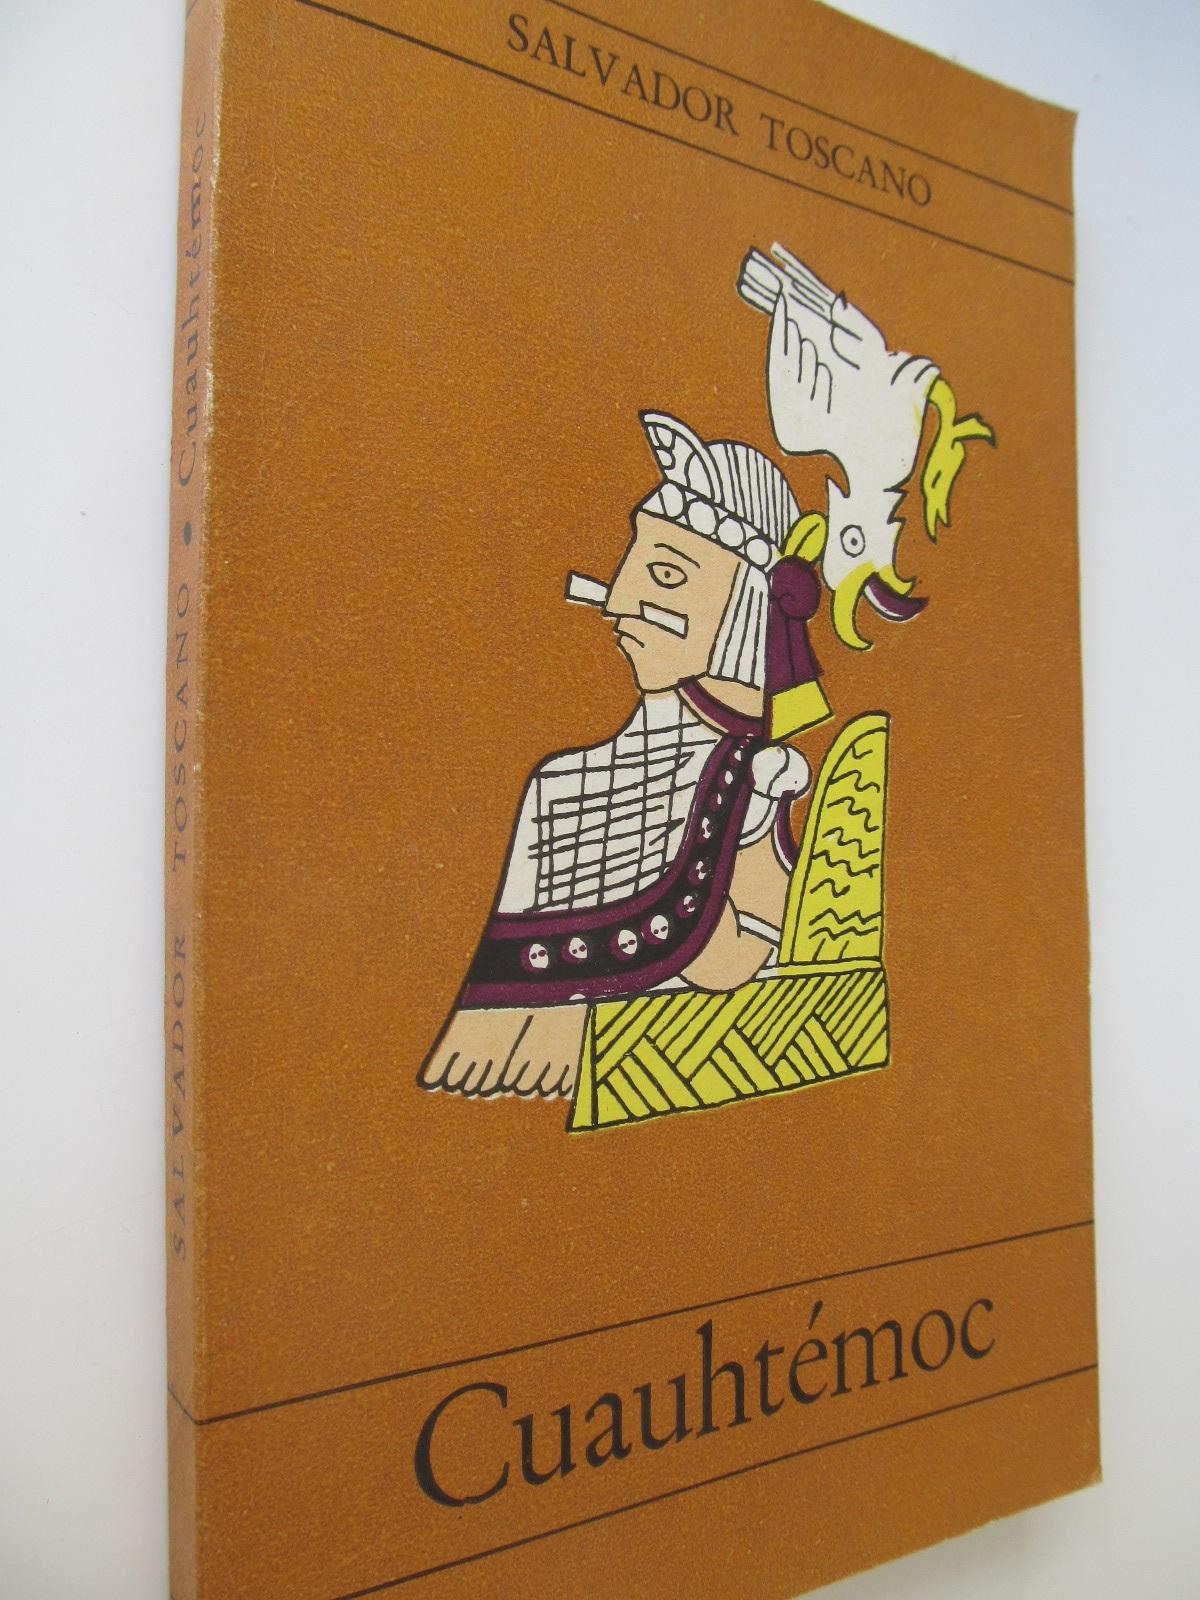 Cuauhtemoc - Salvador Toscano | Detalii carte